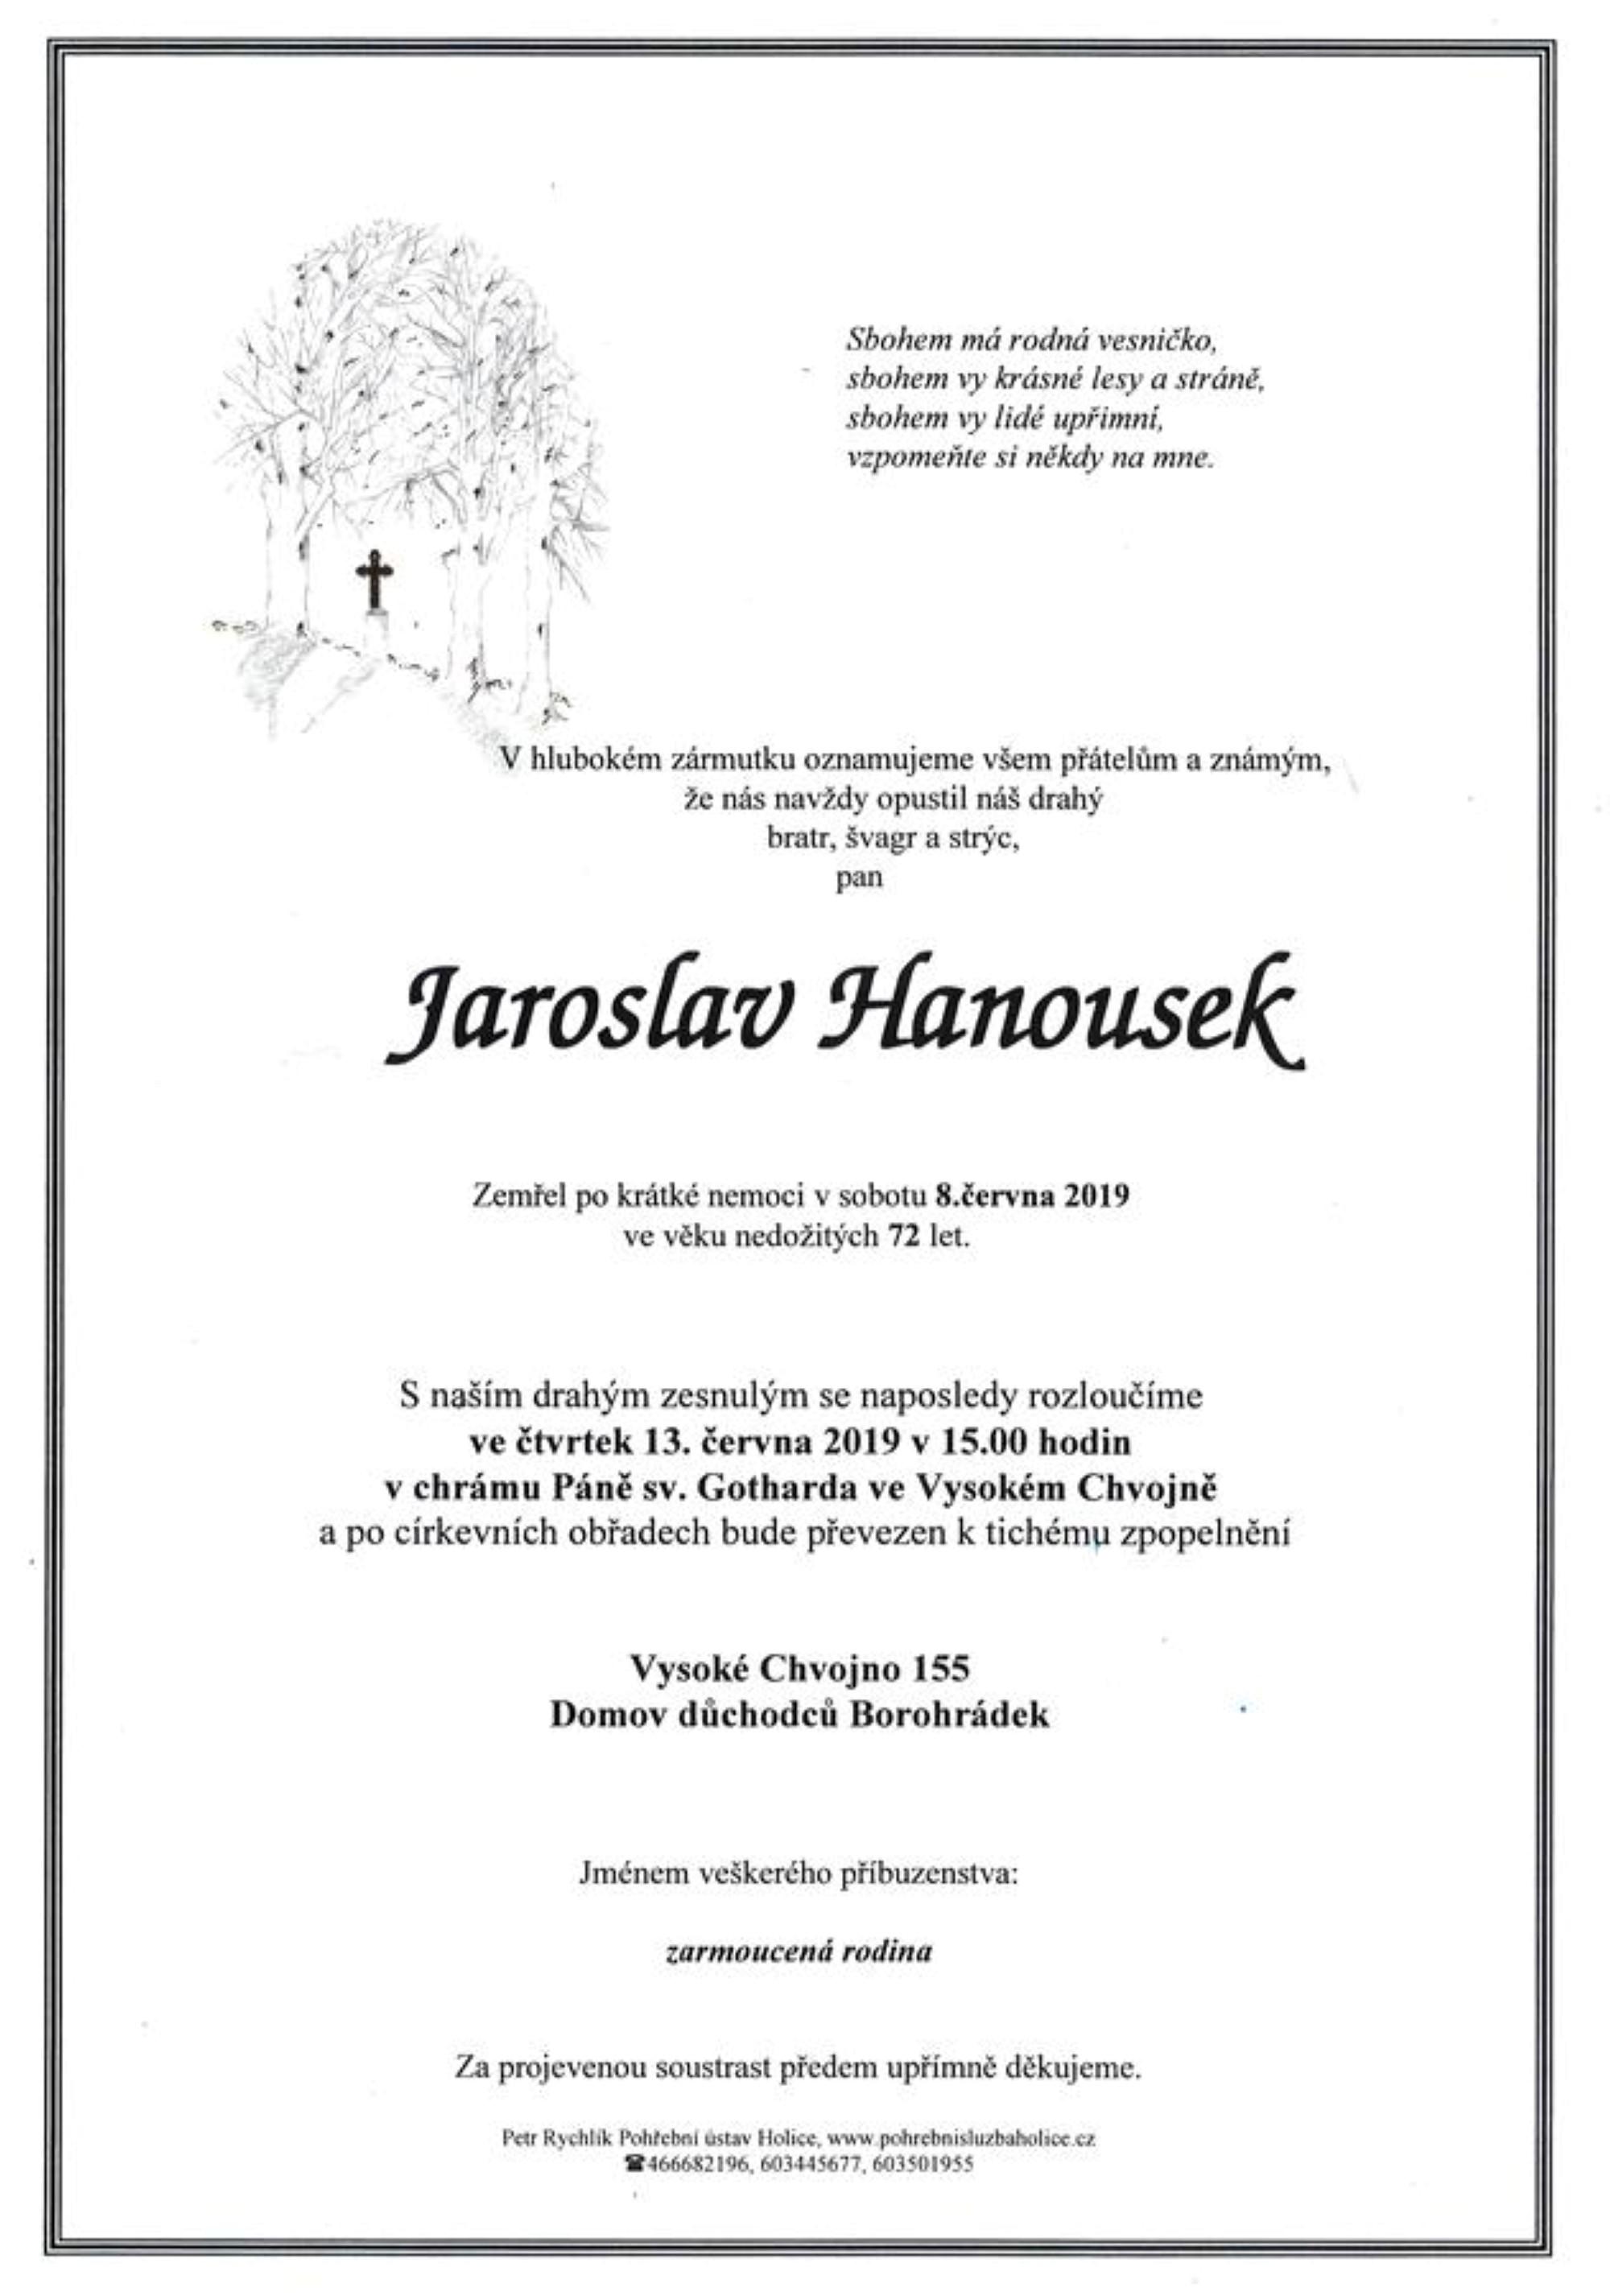 Jaroslav Hanousek